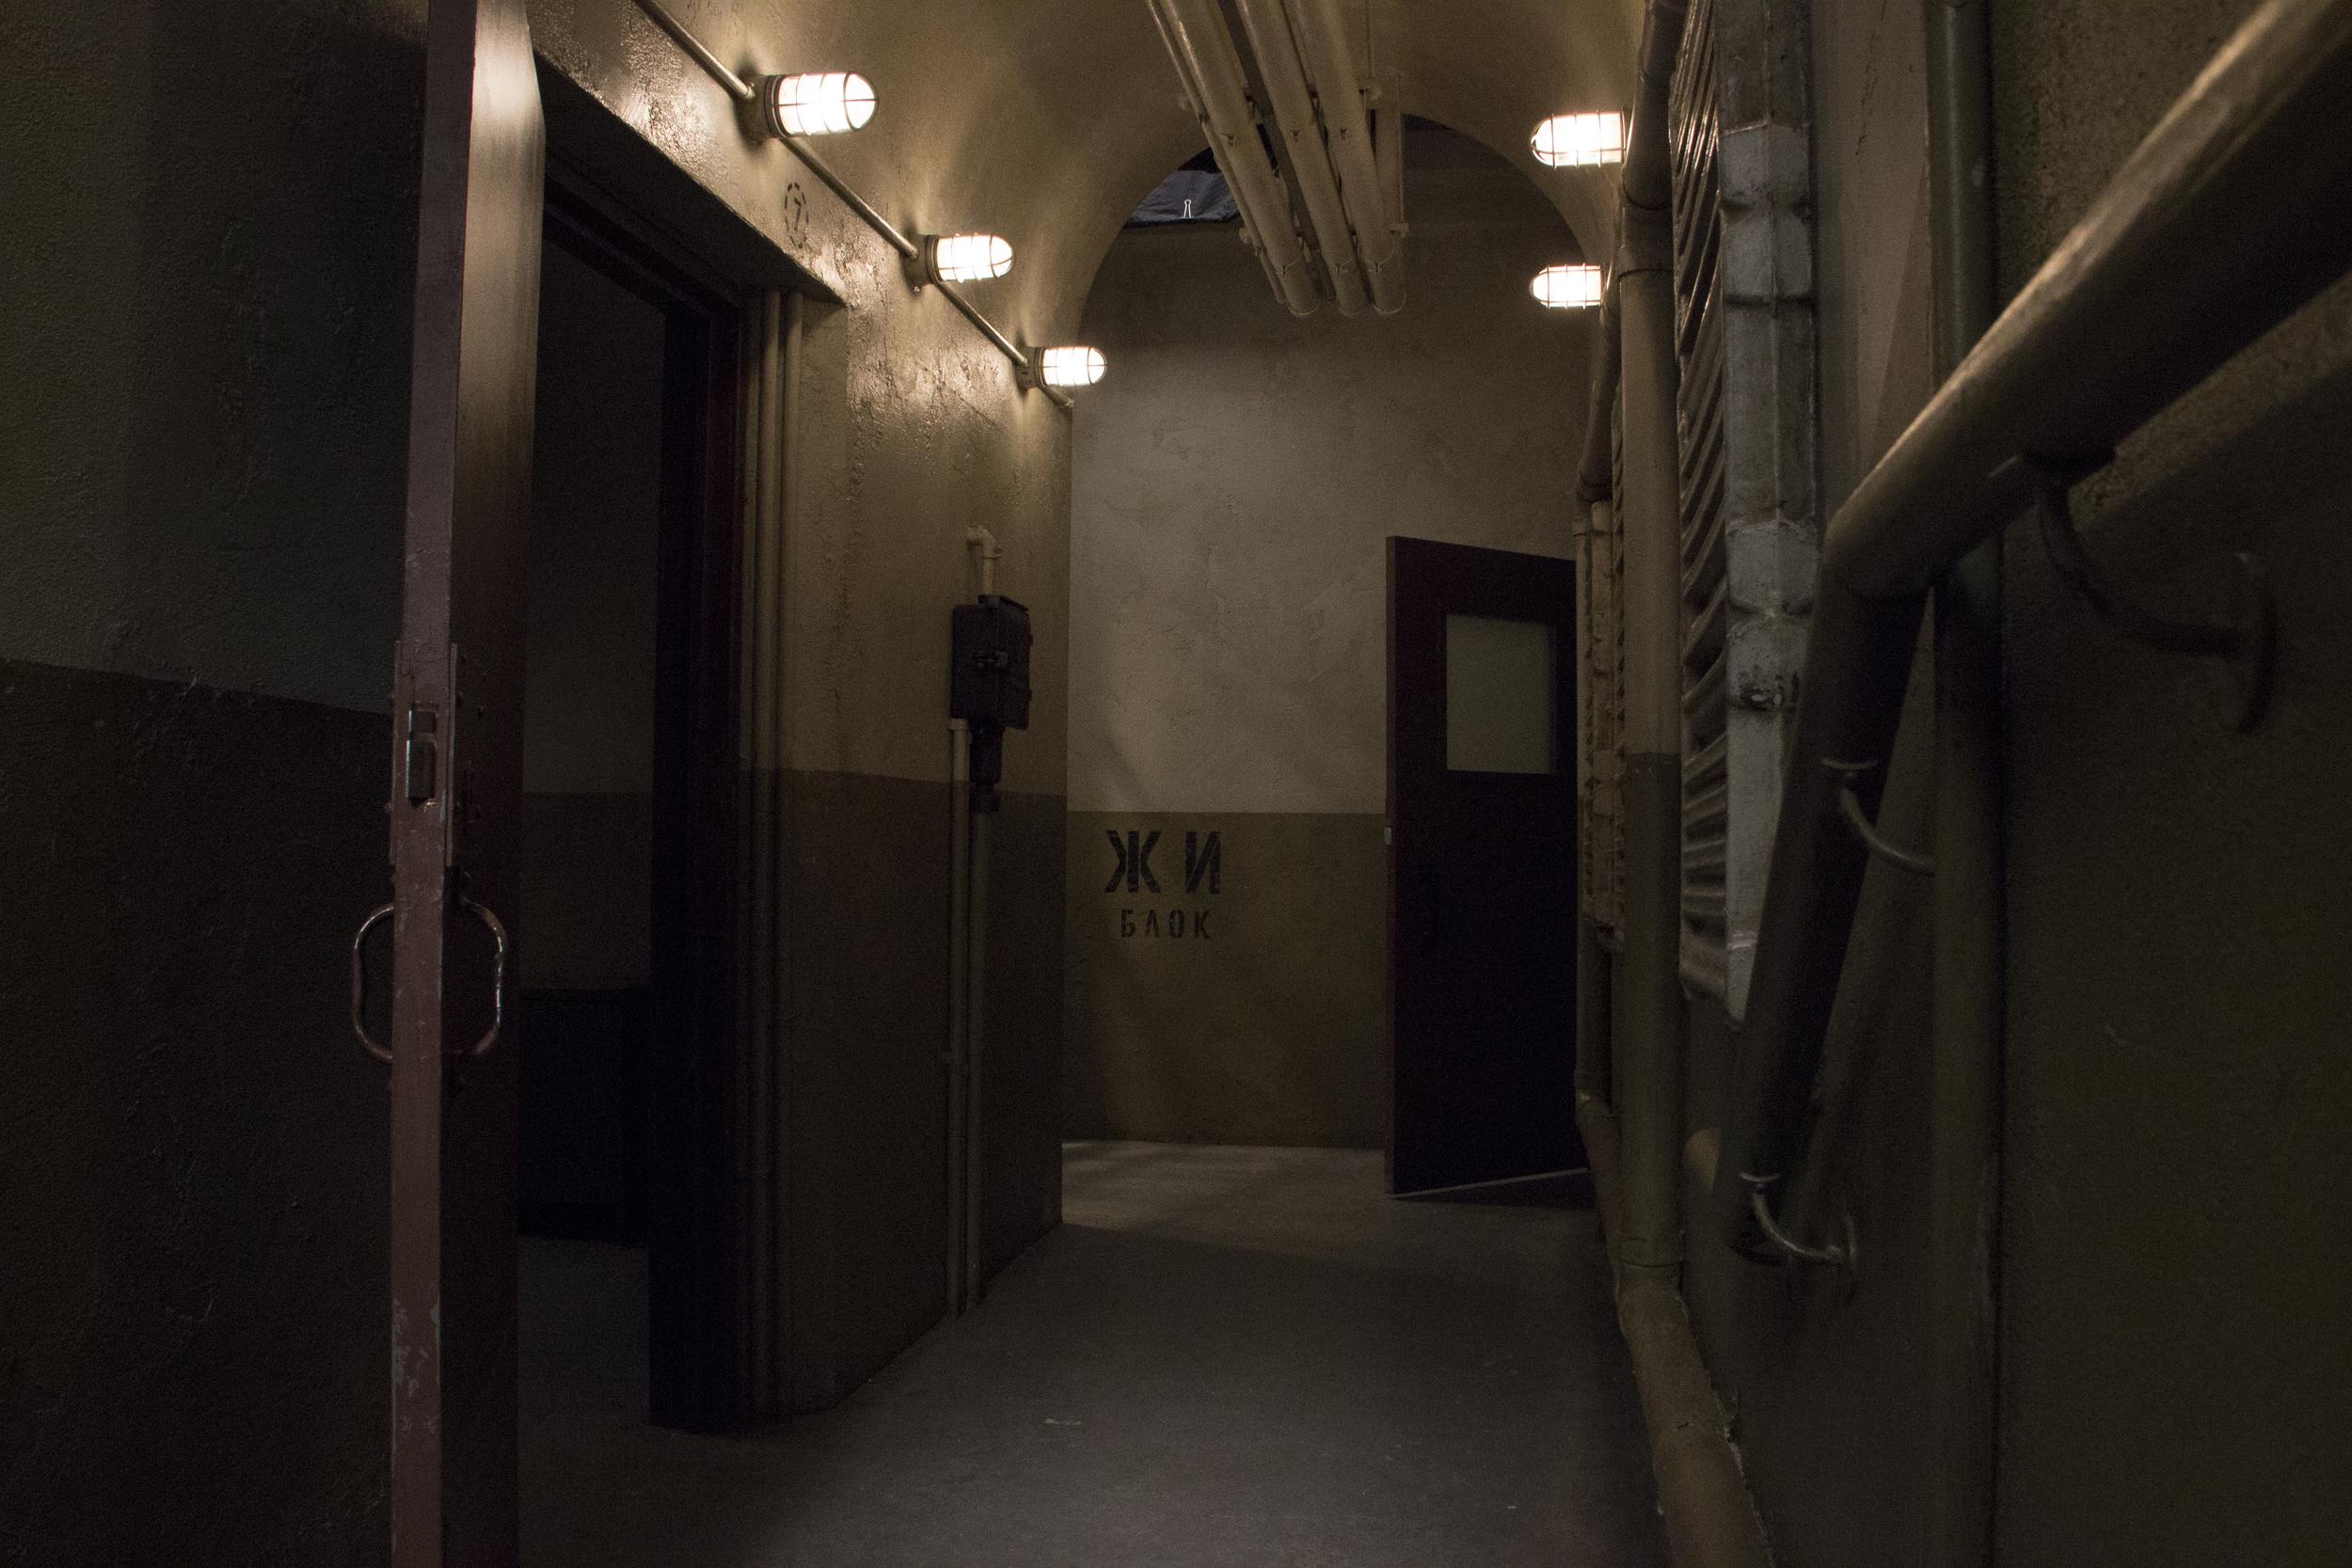 7 prison hallway 5.jpg